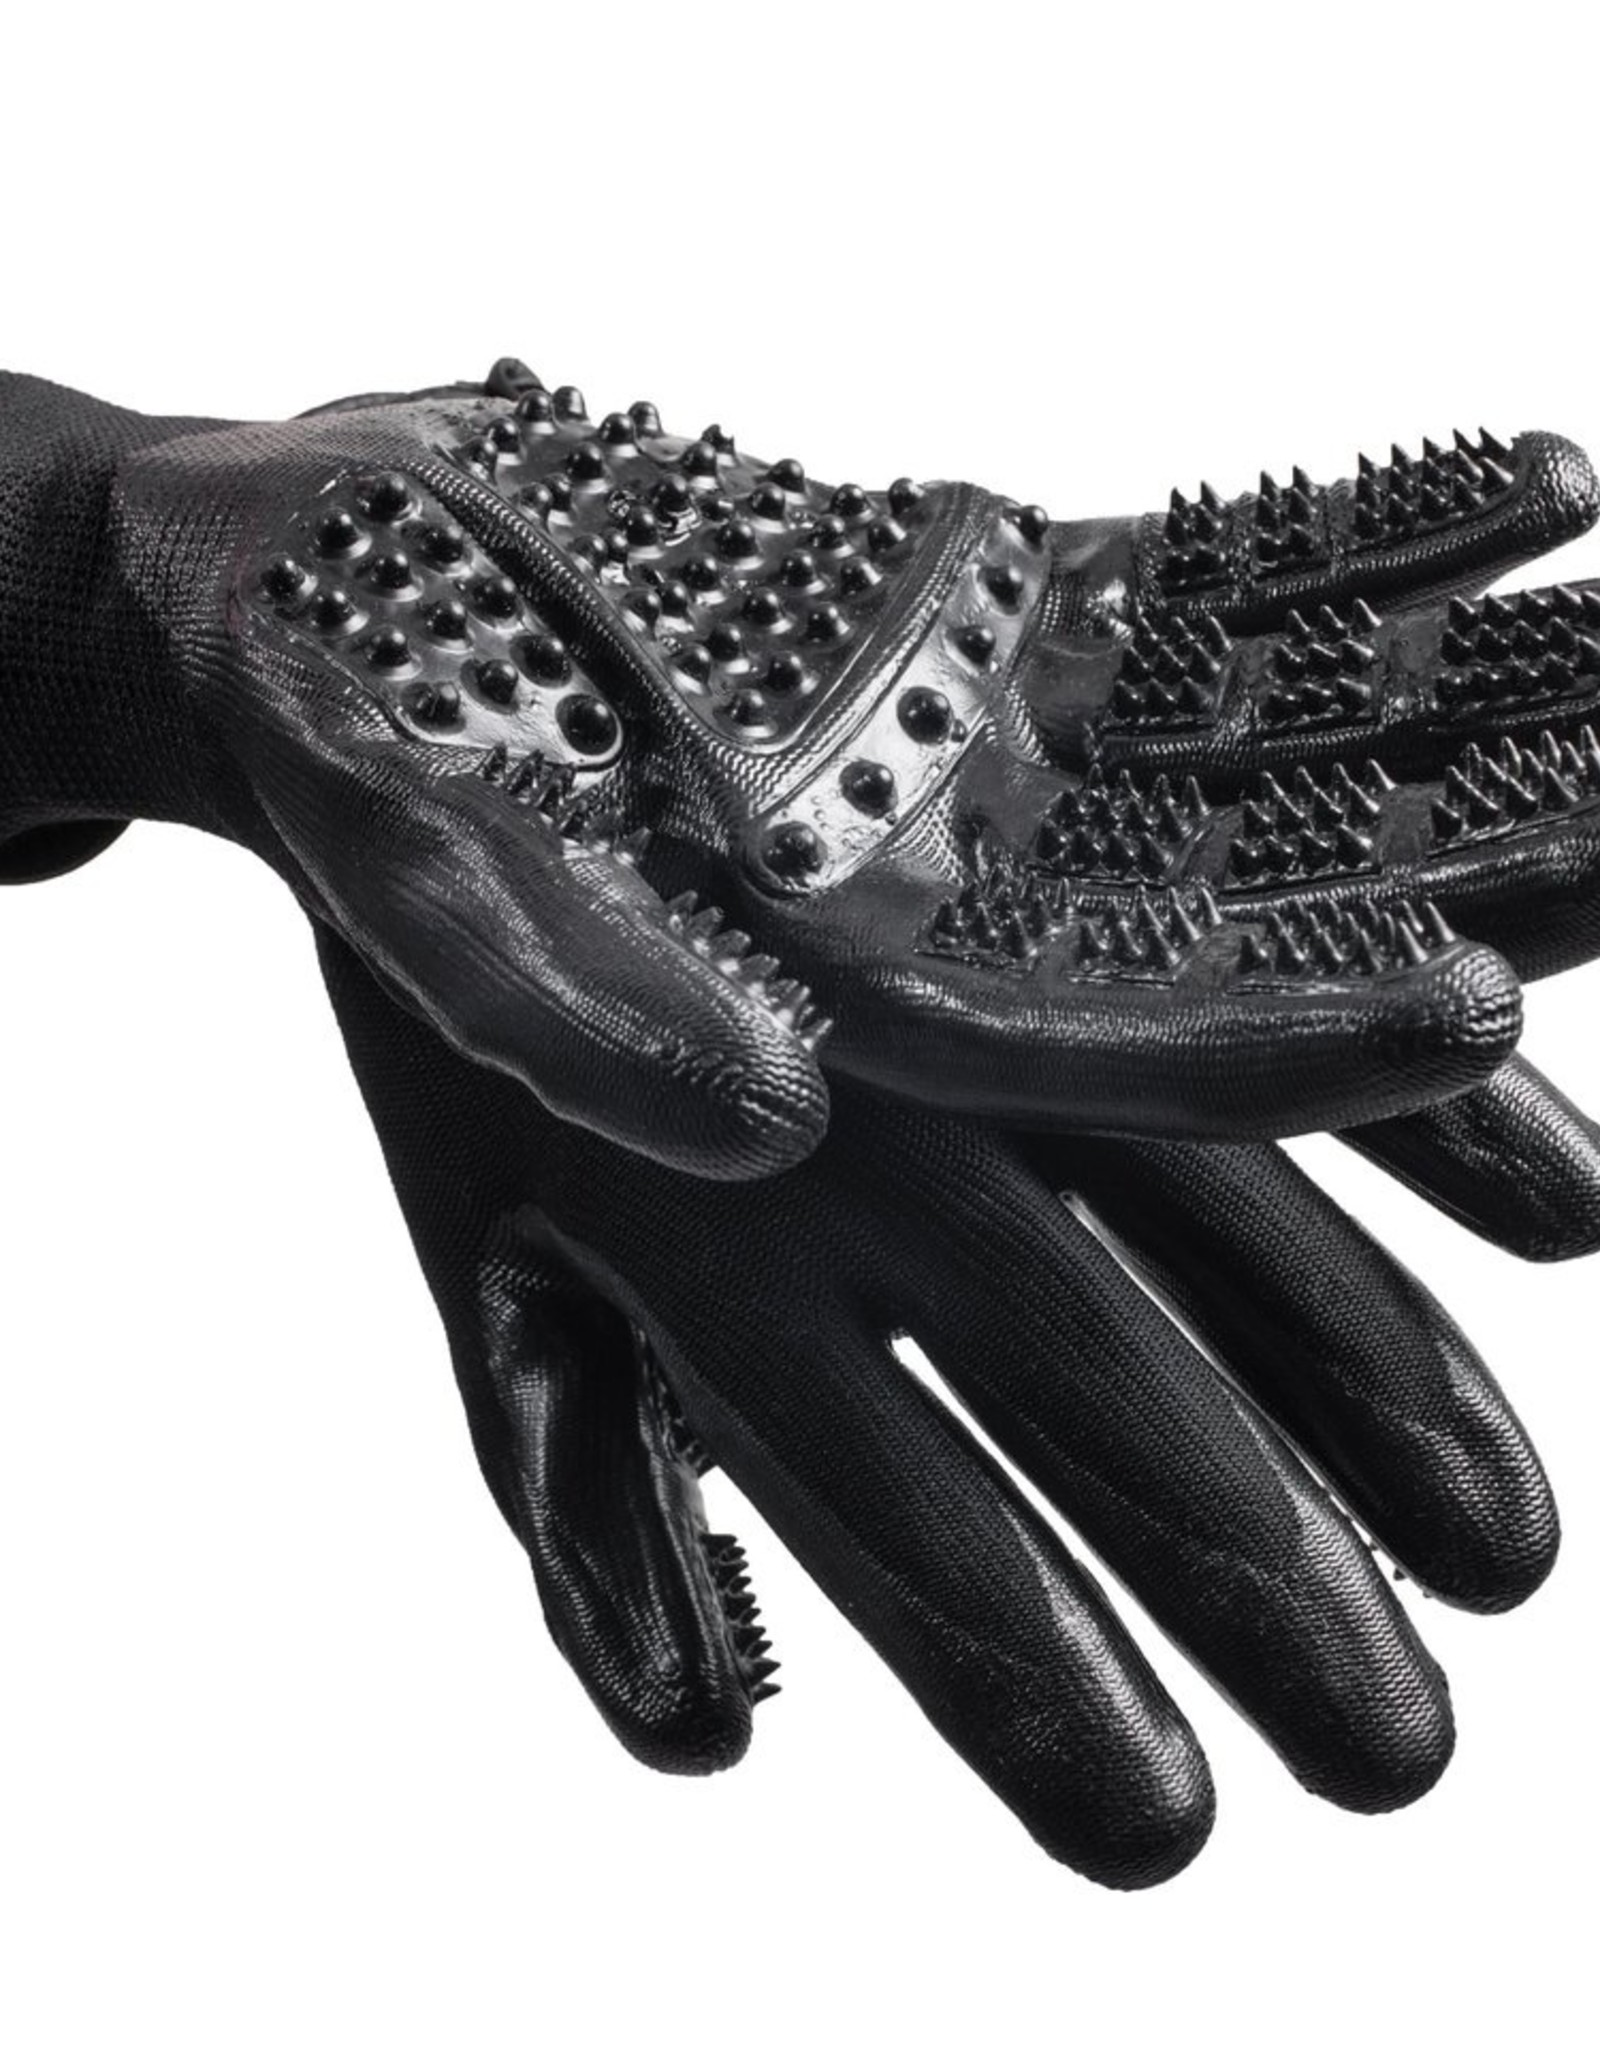 Loving Hands Grooming Gloves